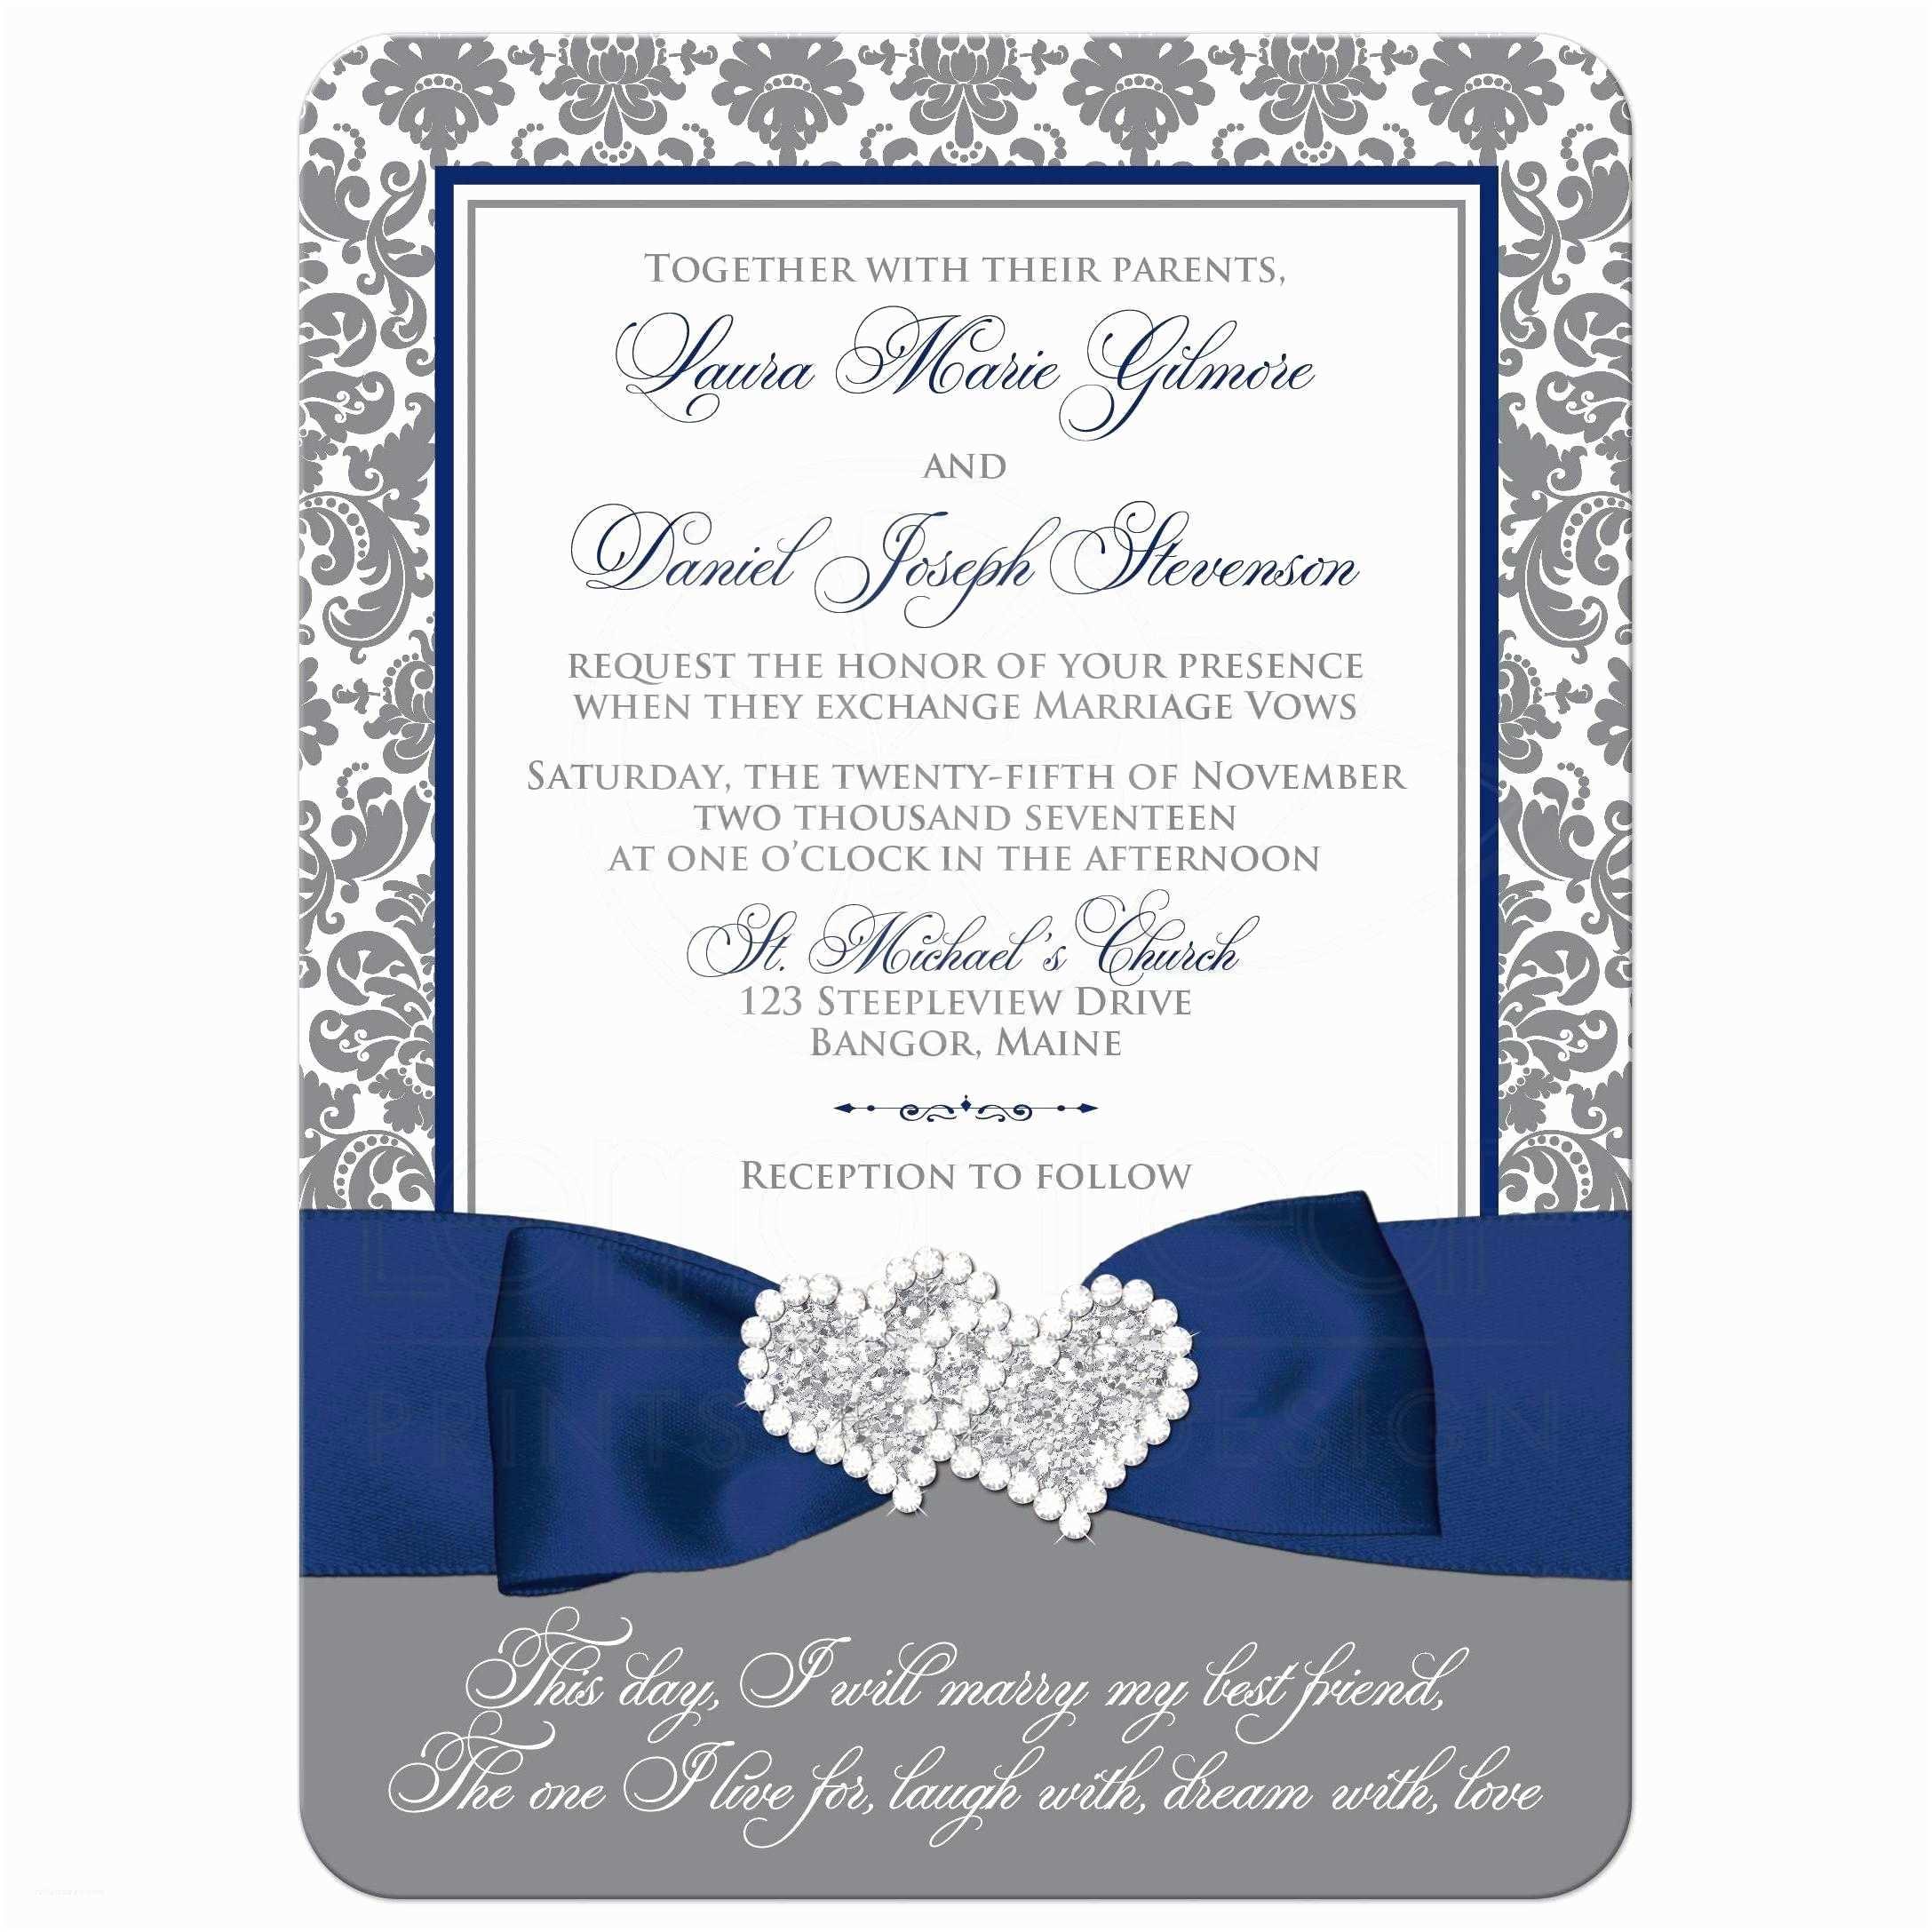 Navy Blue and White Wedding Invitations Navy Blue White and Gray Damask Wedding Invitation